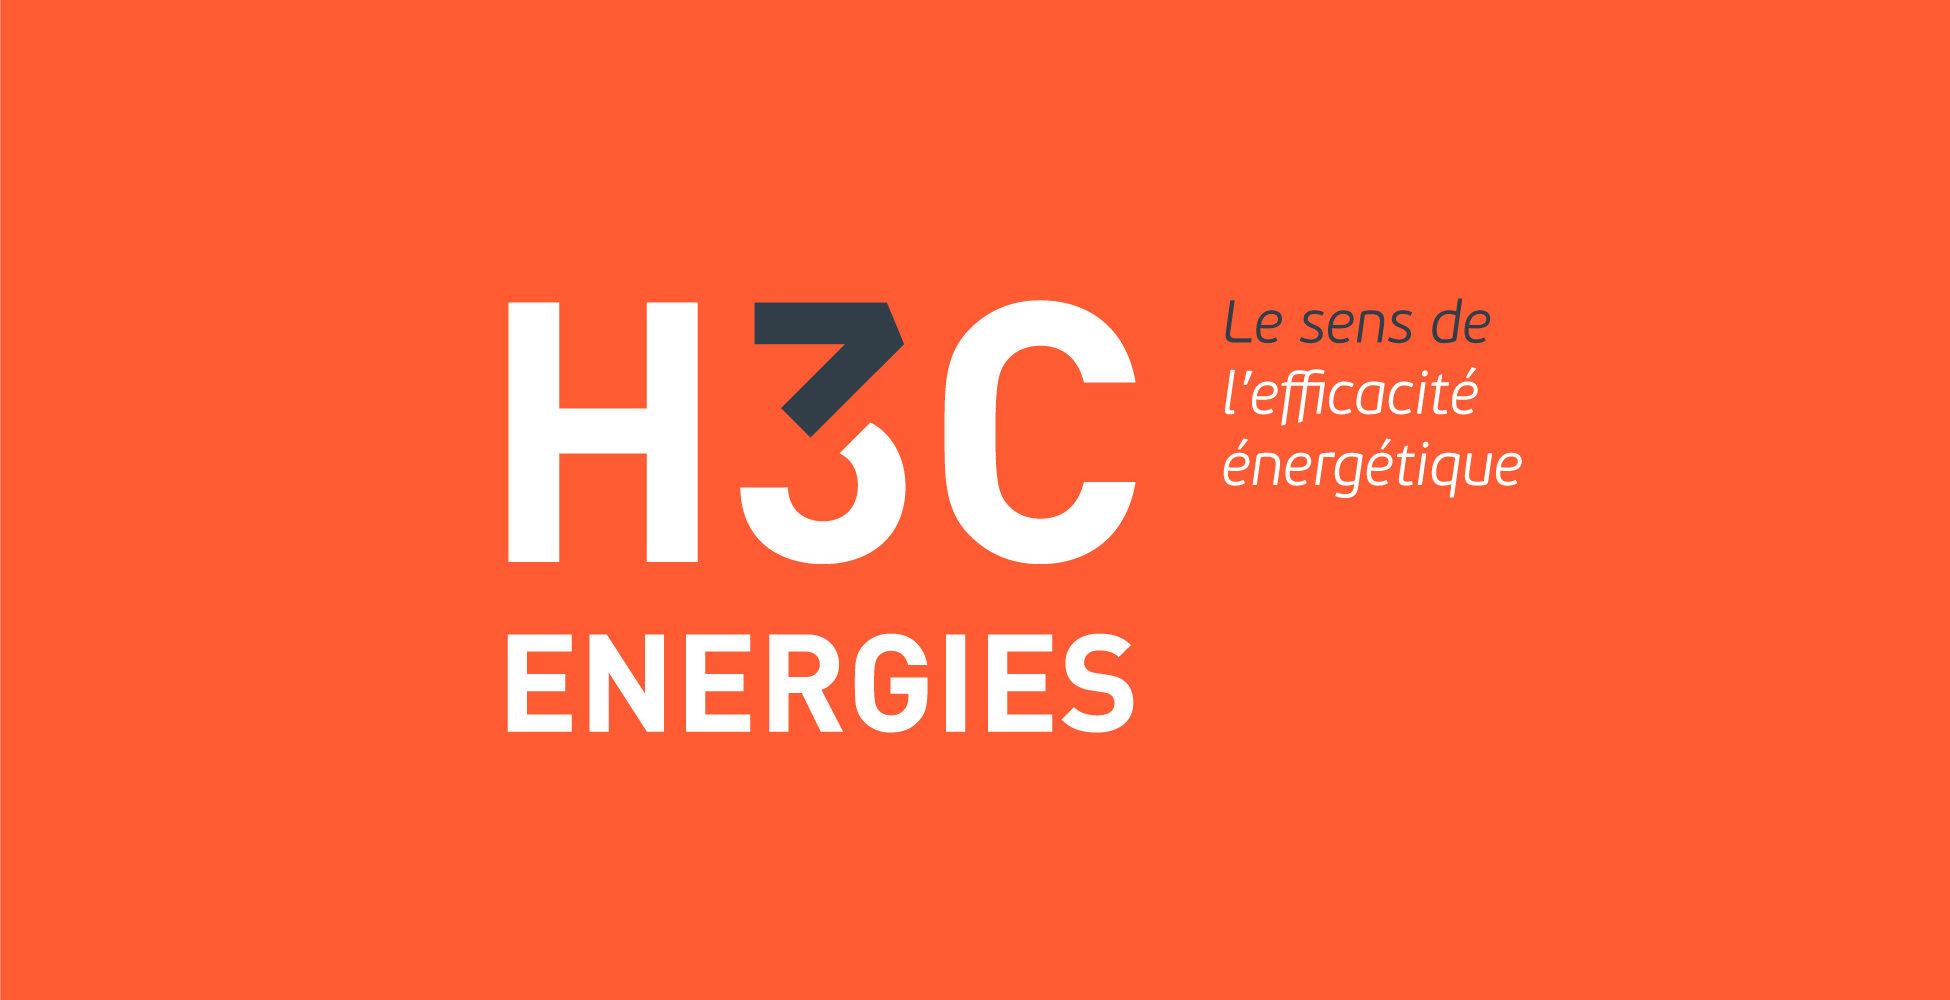 Logo H3C energies conseil efficacité energetique